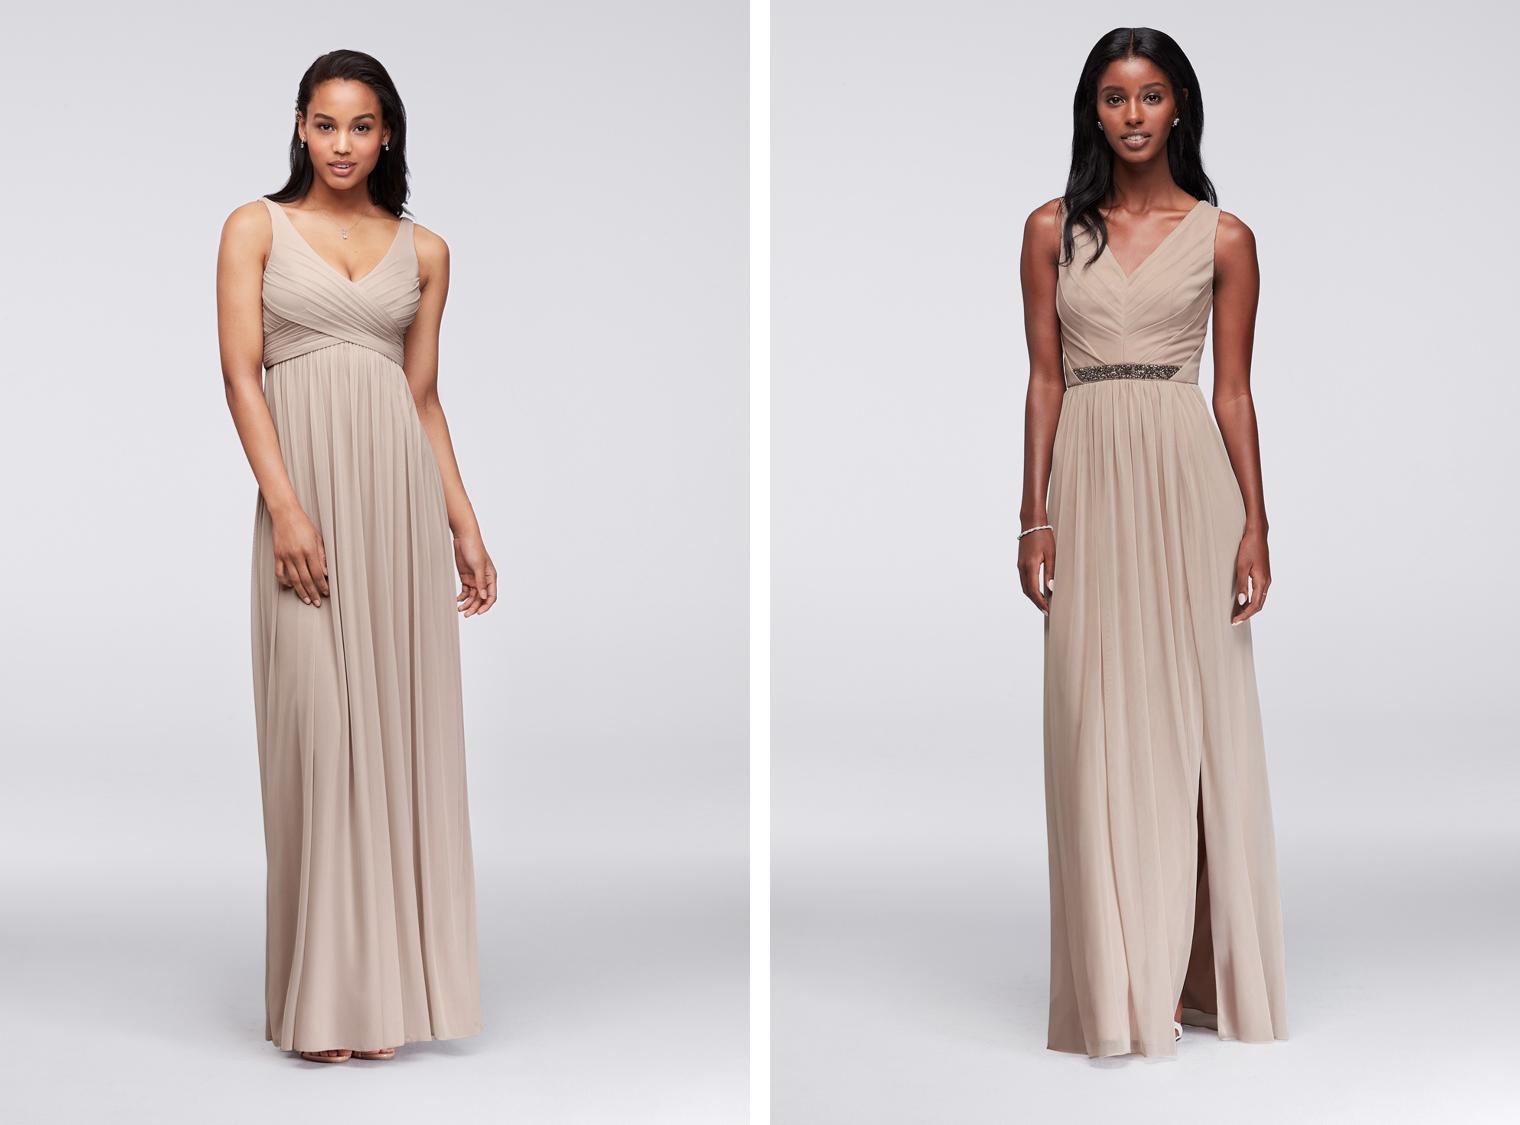 Bra-Friendly Bridesmaid Dresses